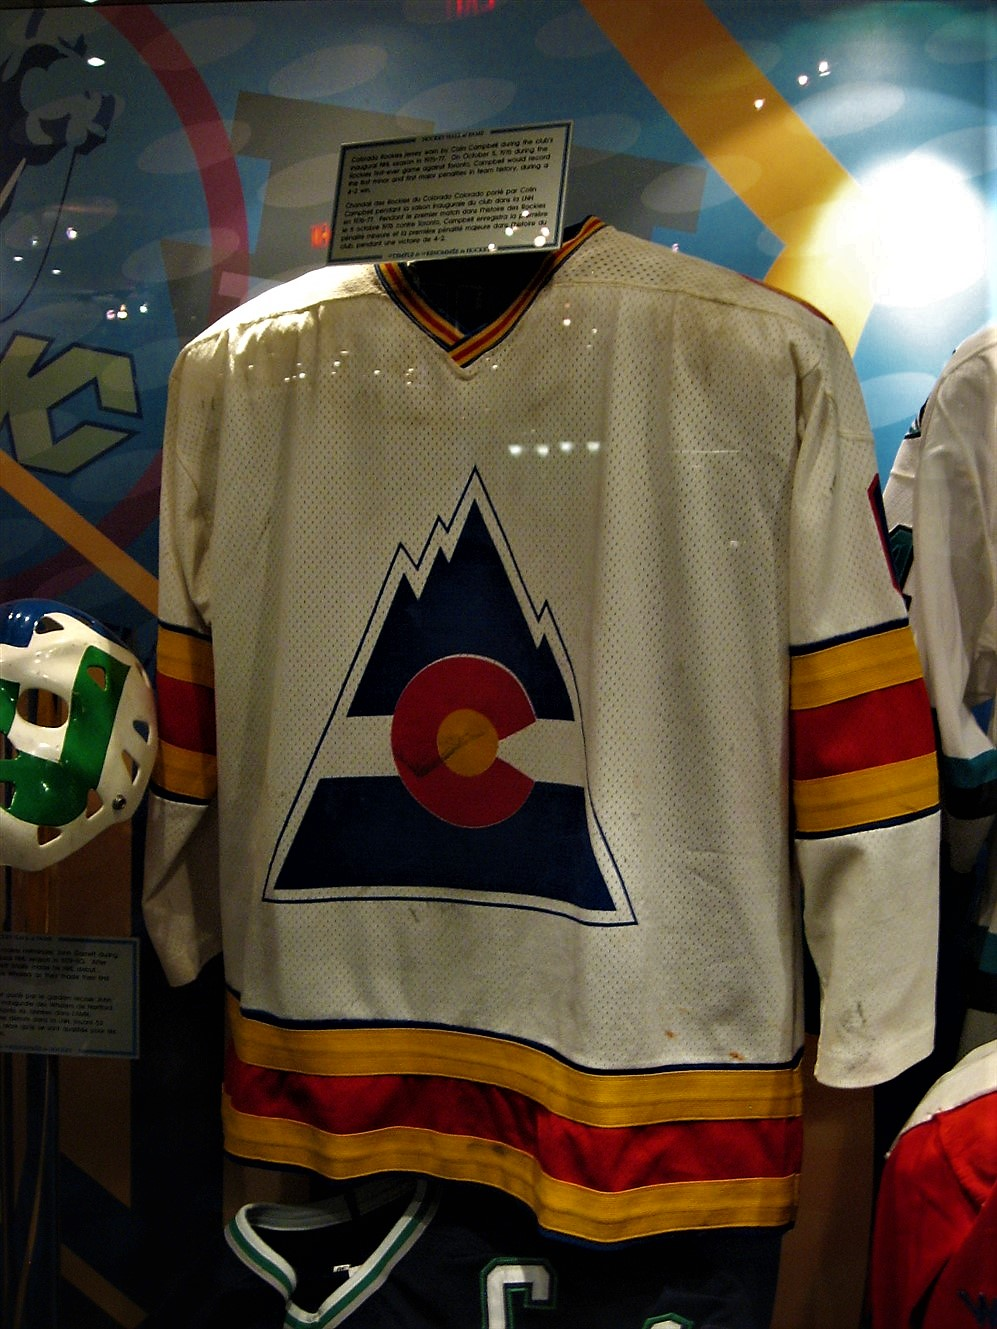 2008 07 05 48 Toronto Hockey Hall of Fame.jpg